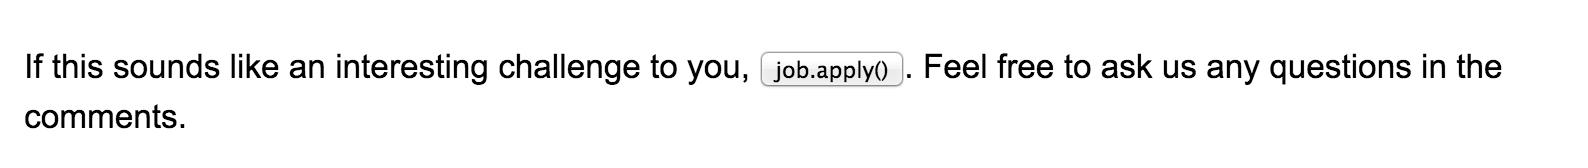 Your job posting sucks